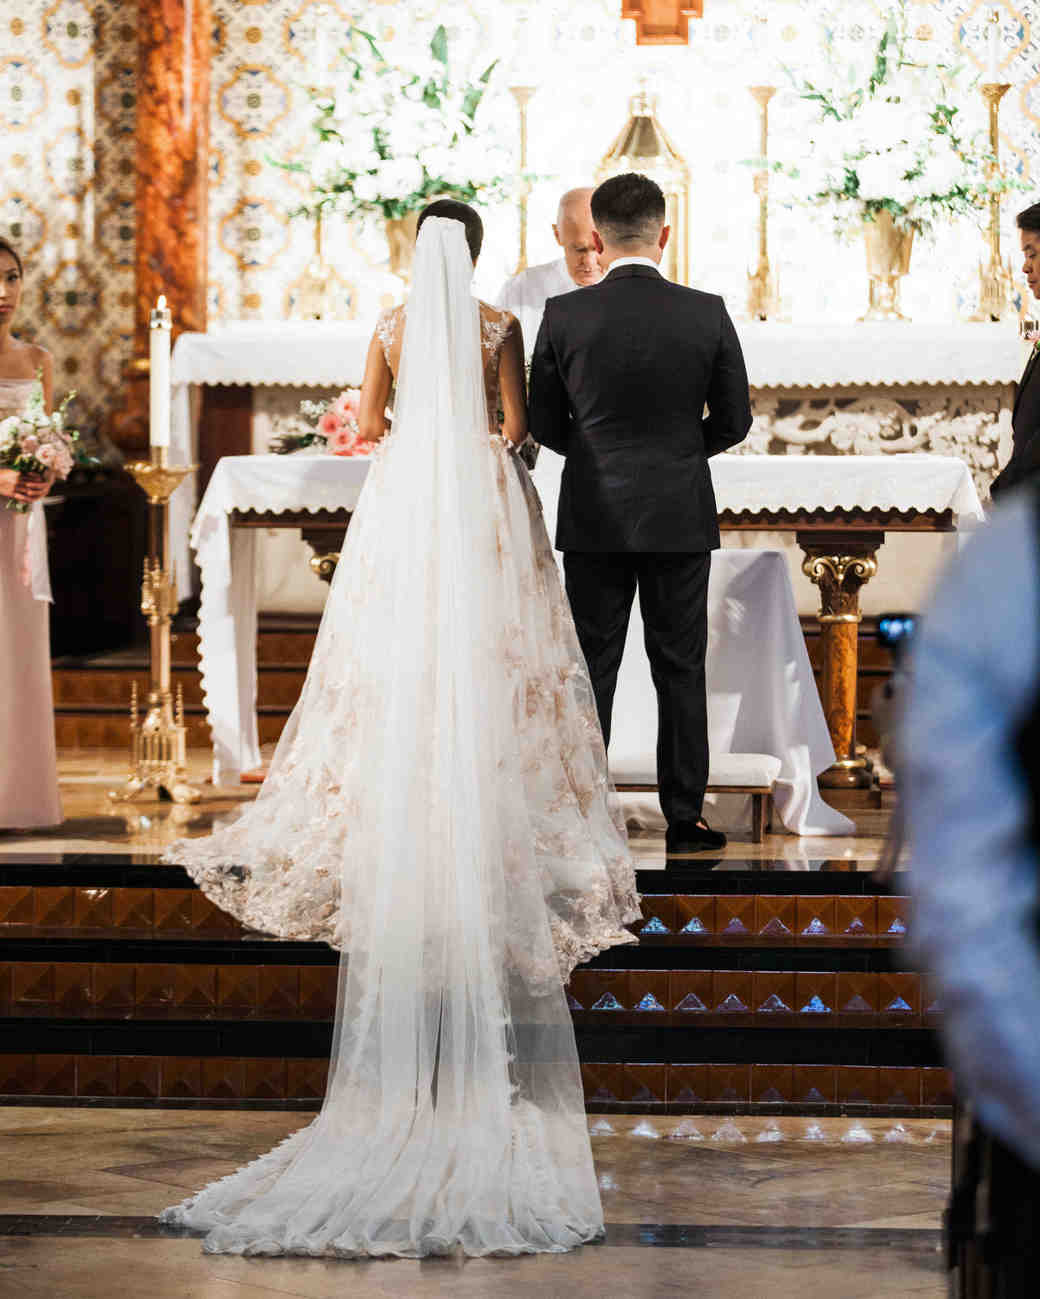 chapel altar bride groom ceremony floral arrangements